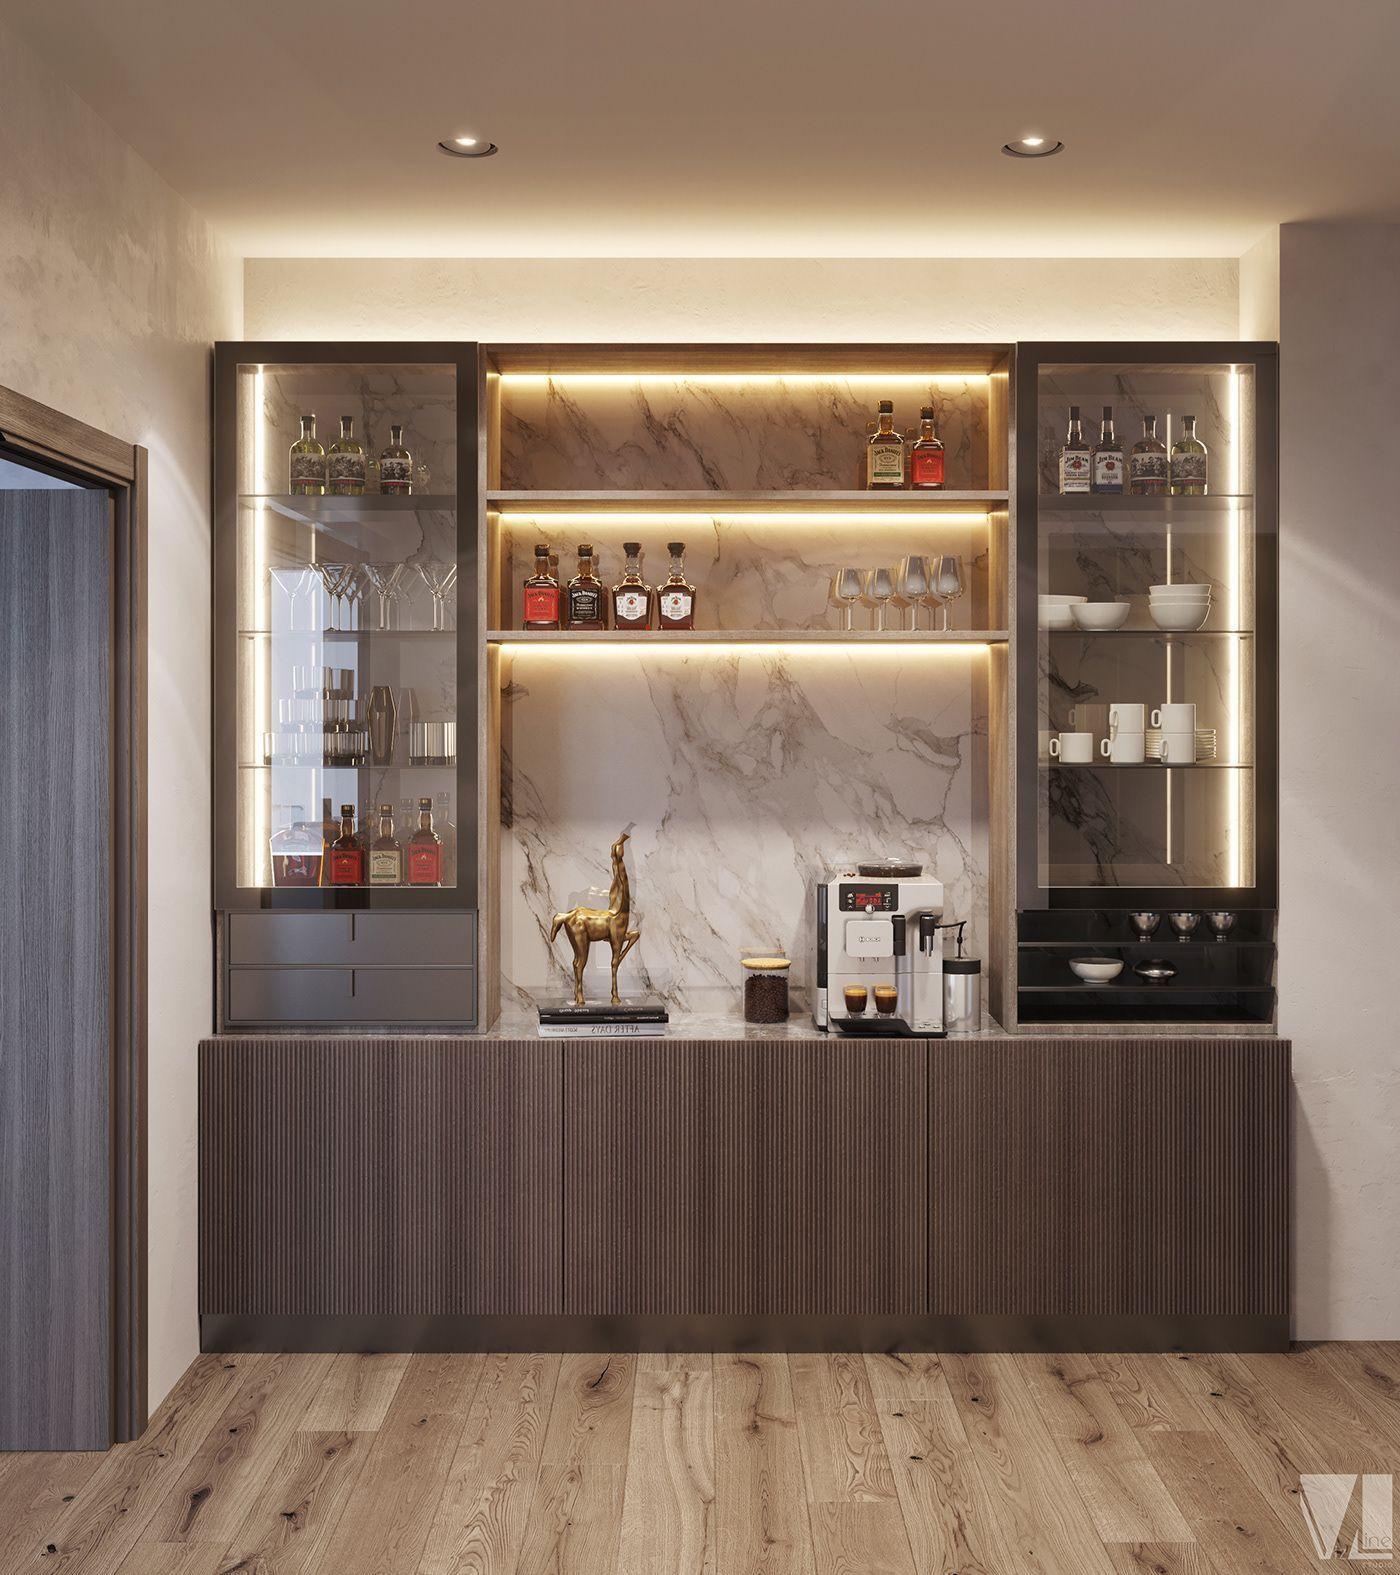 Kitchen Design Free Software L Shape Kitchen Design Lowes Kitchen Design Ikea Kitchen Design Tool Kitchen In 2020 Home Bar Designs Modern Home Bar Living Room Bar